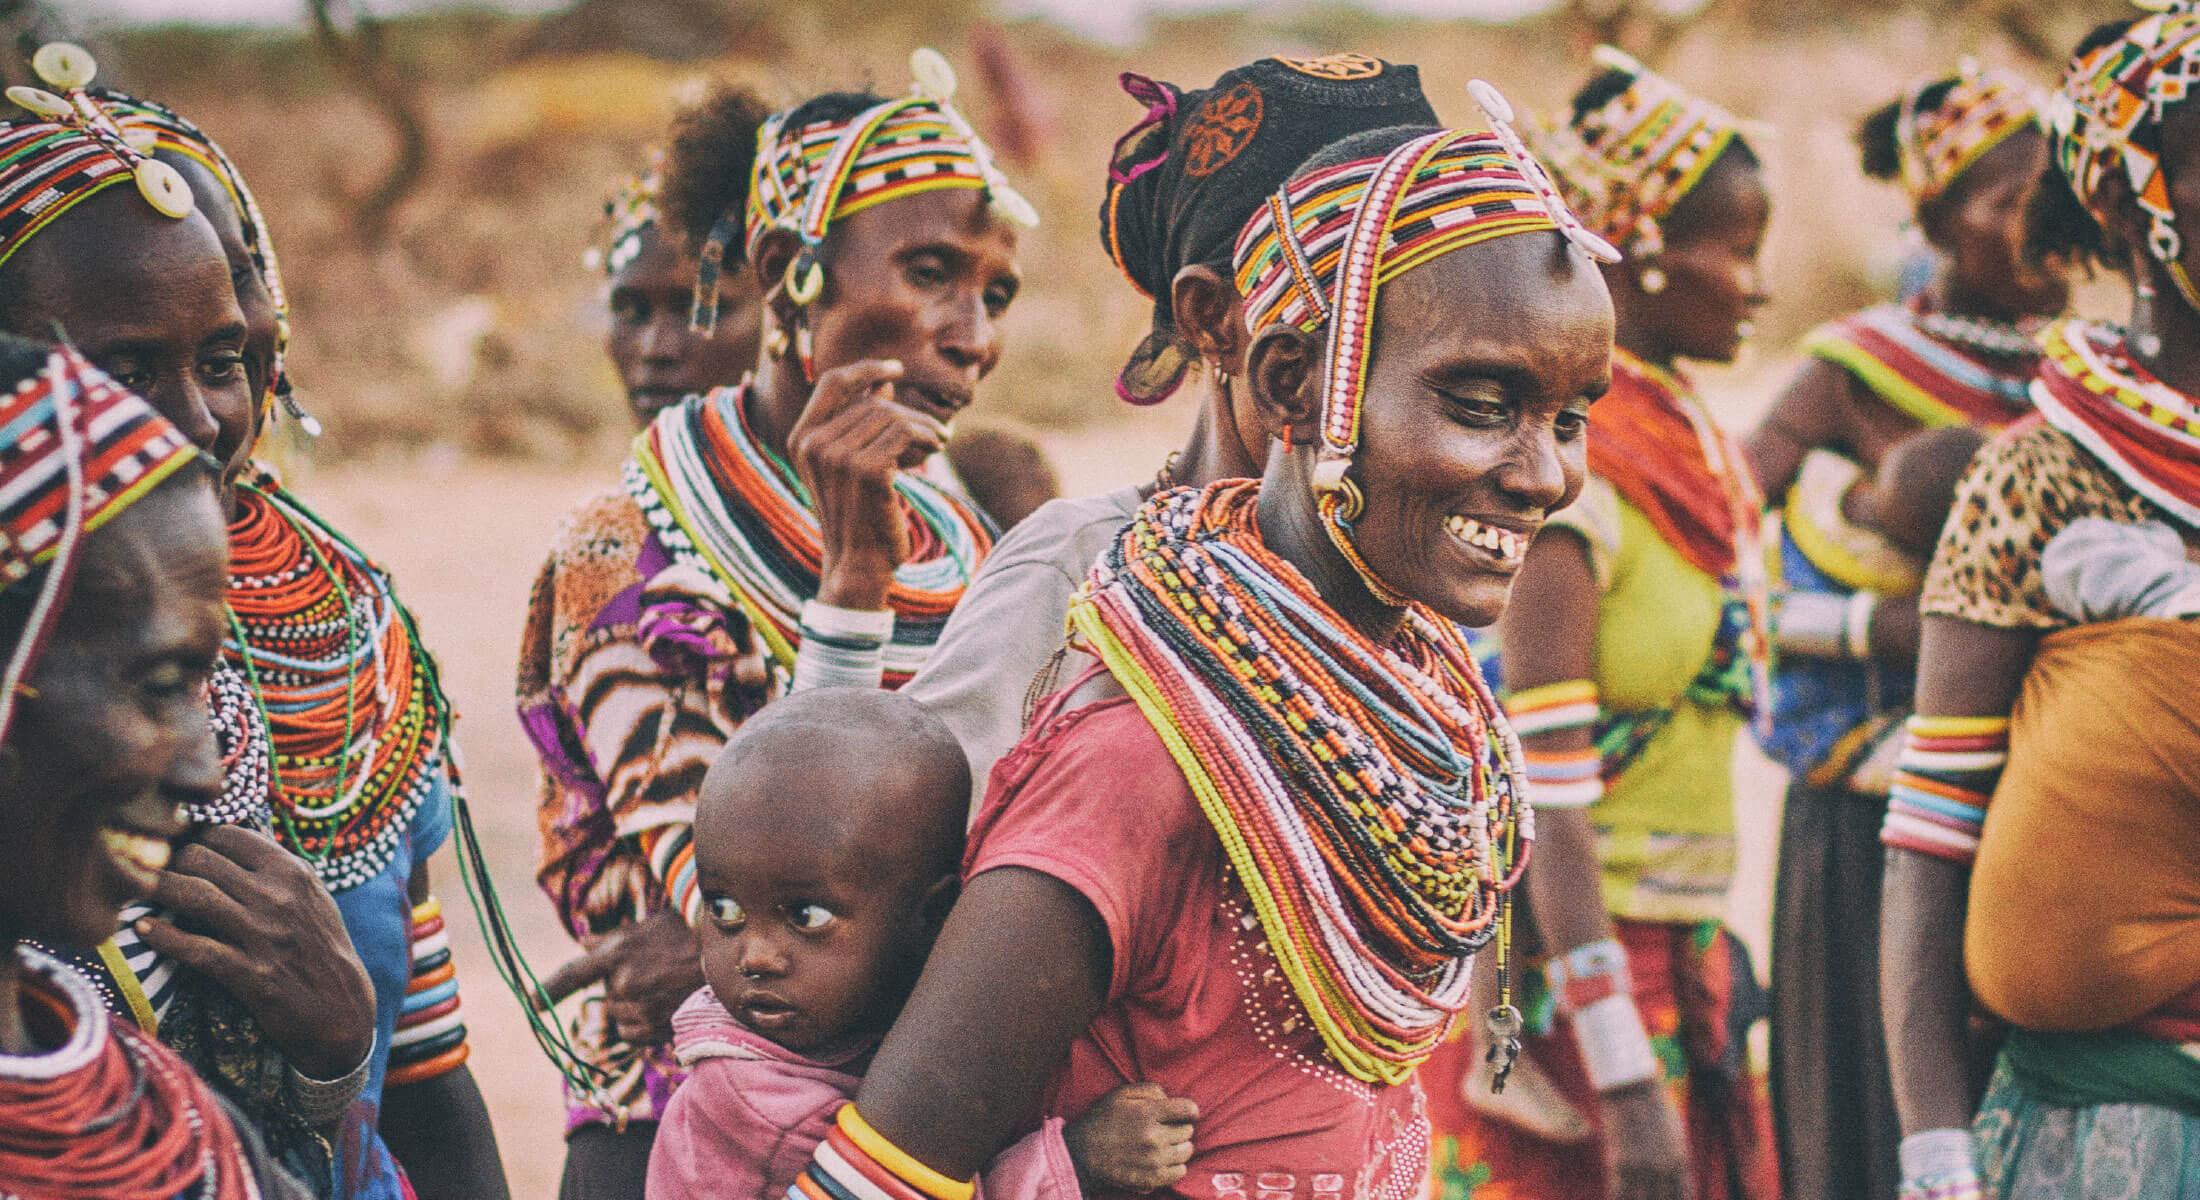 African tribal women and children